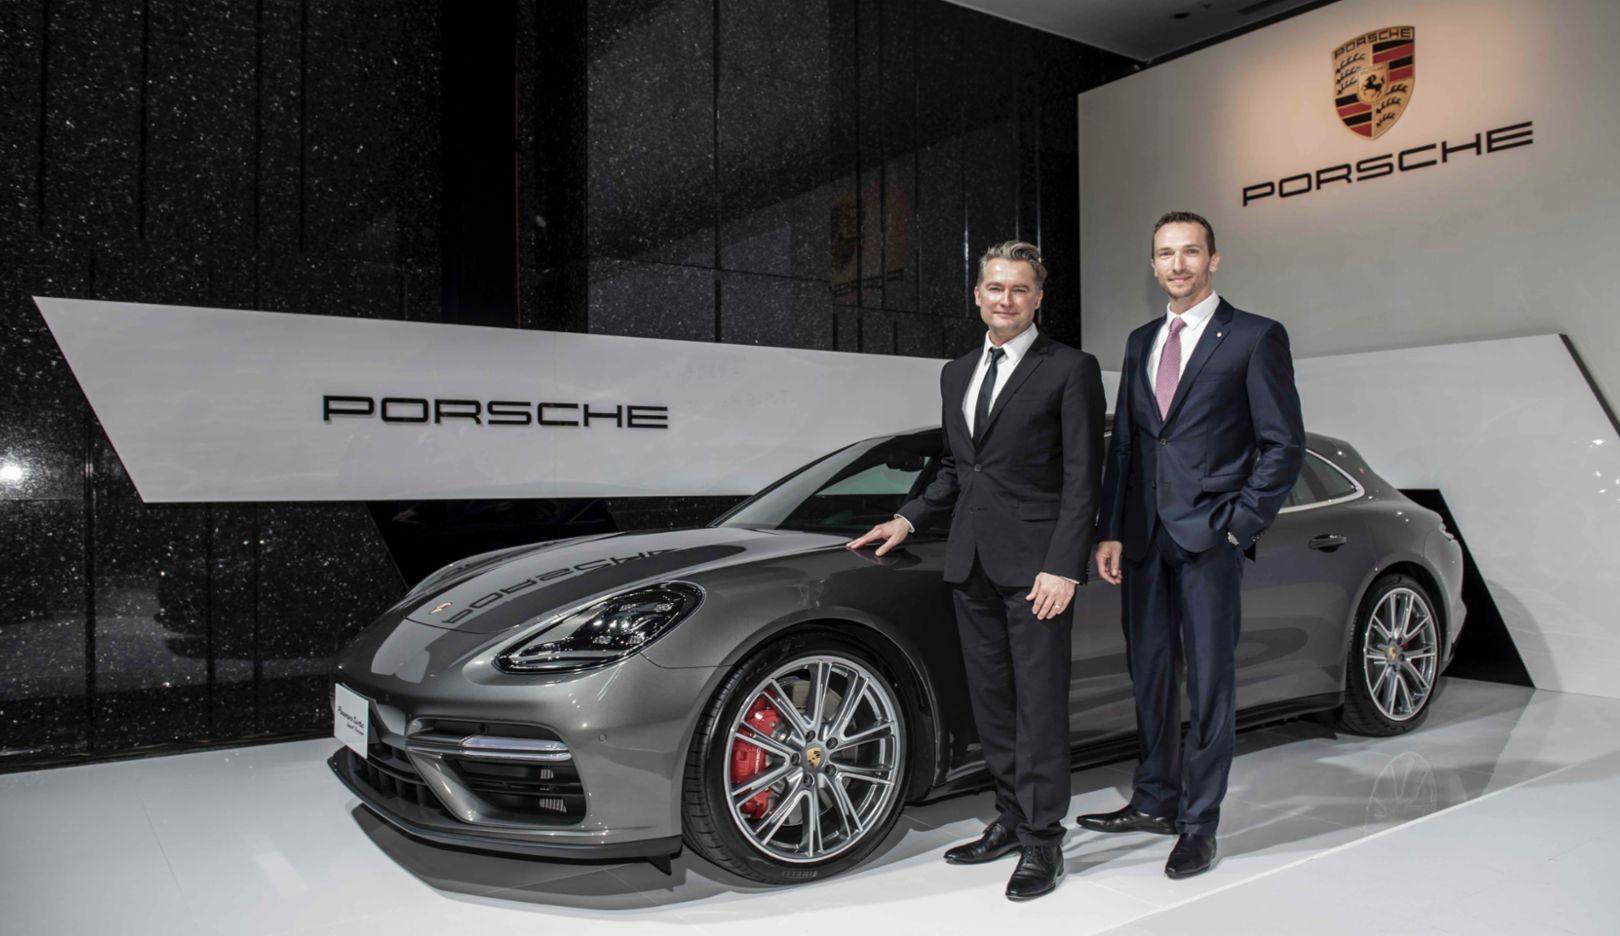 Matthias Becker, Vice President of Region Overseas and Emerging Markets, Martin Limpert, Chief Executive Officer Porsche Taiwan, l-r, Panamera Turbo Sport, Taipei, 2018, Porsche AG